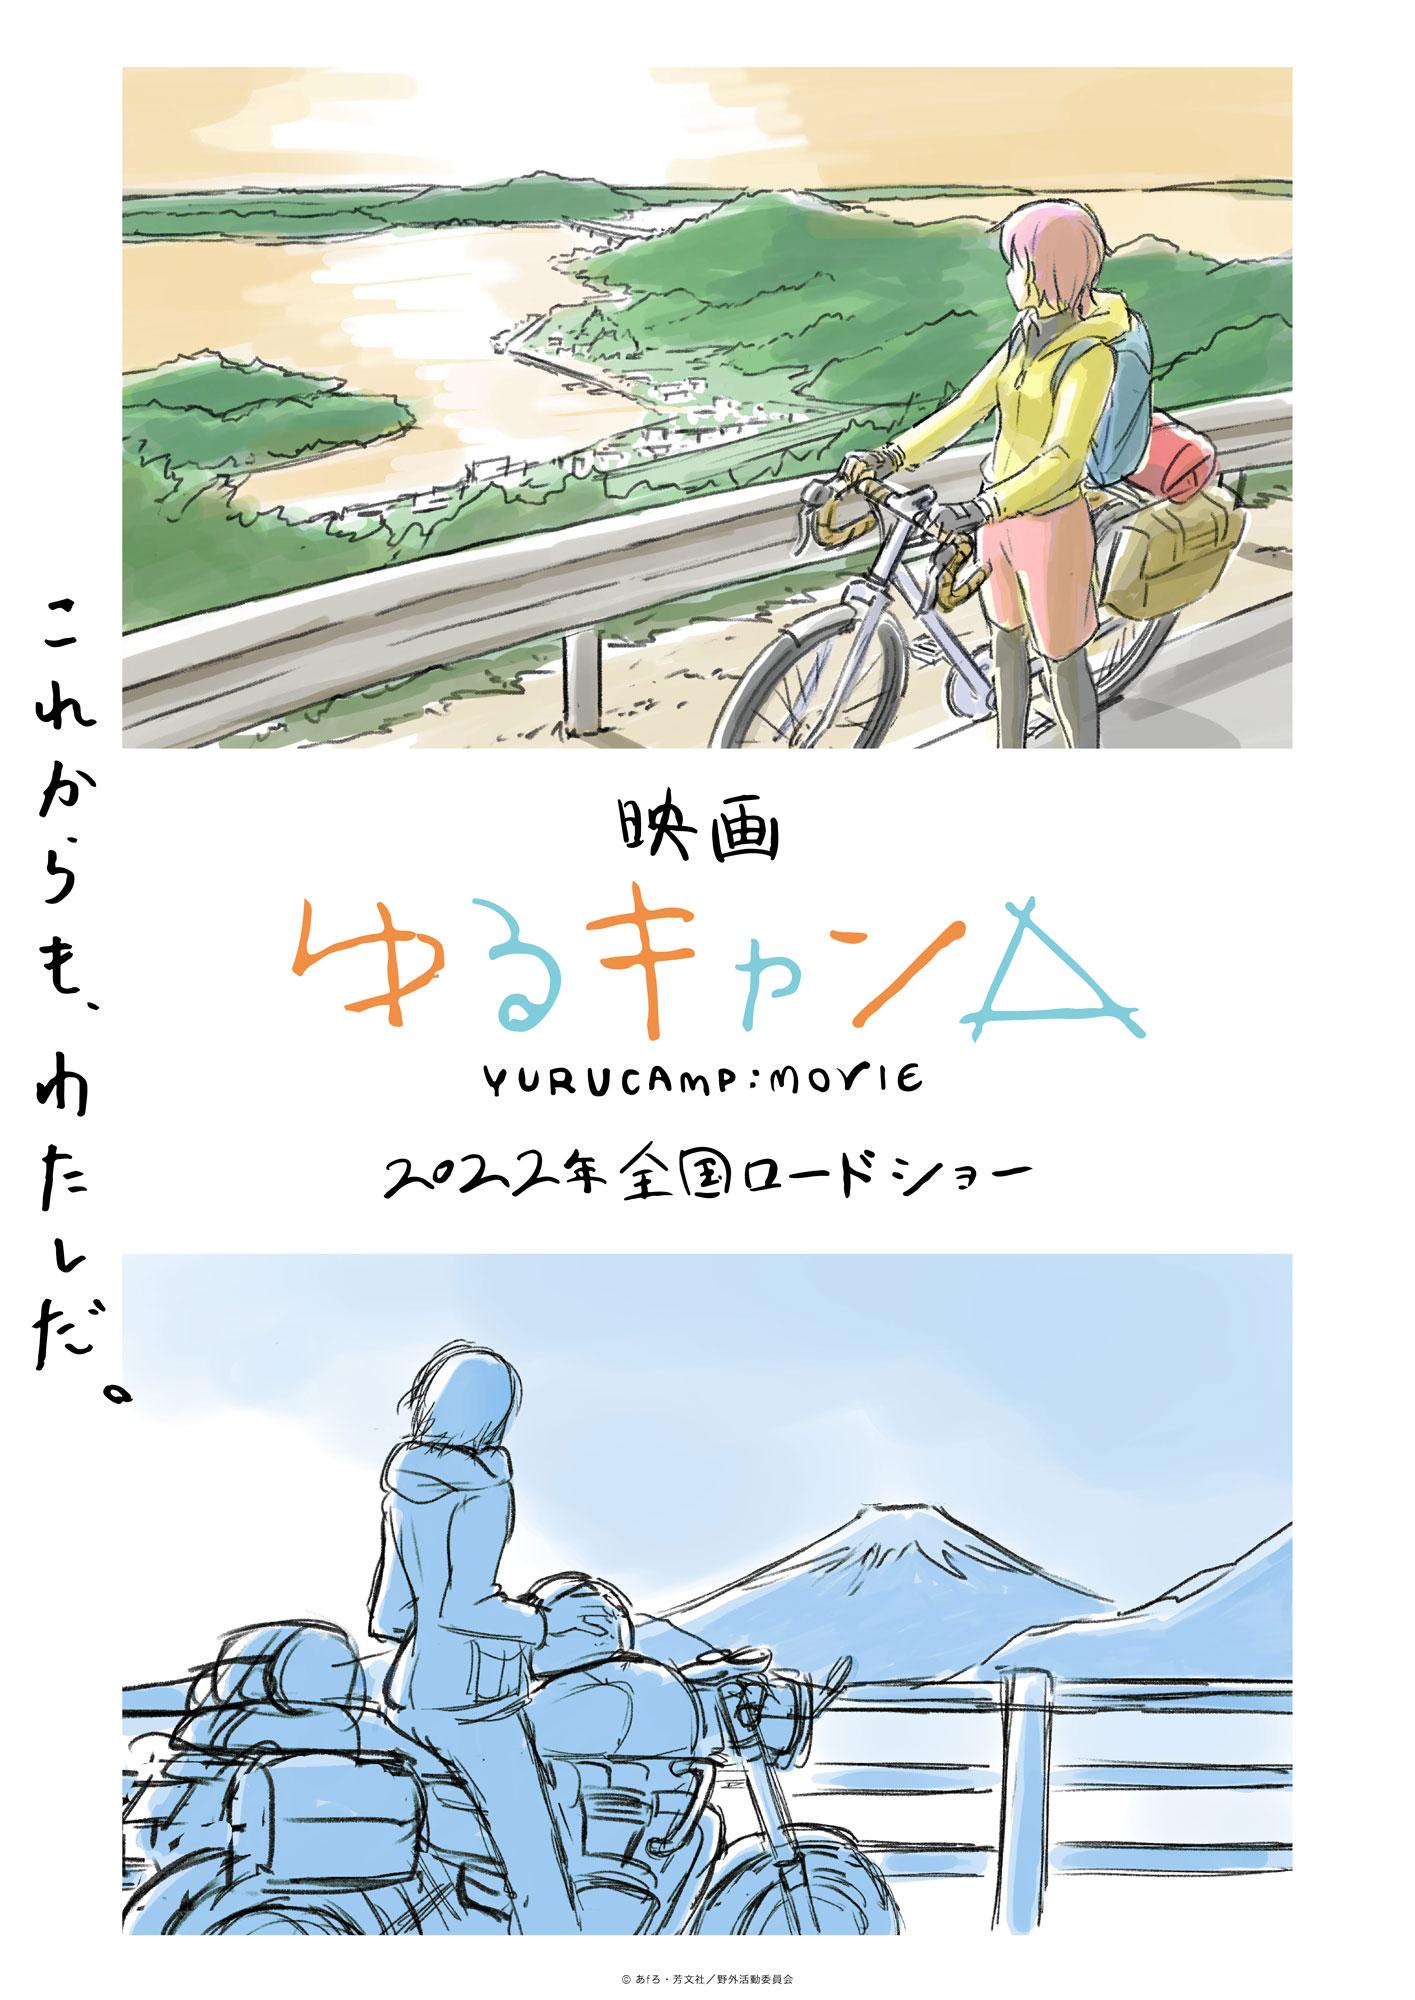 Yuru Camp movie poster